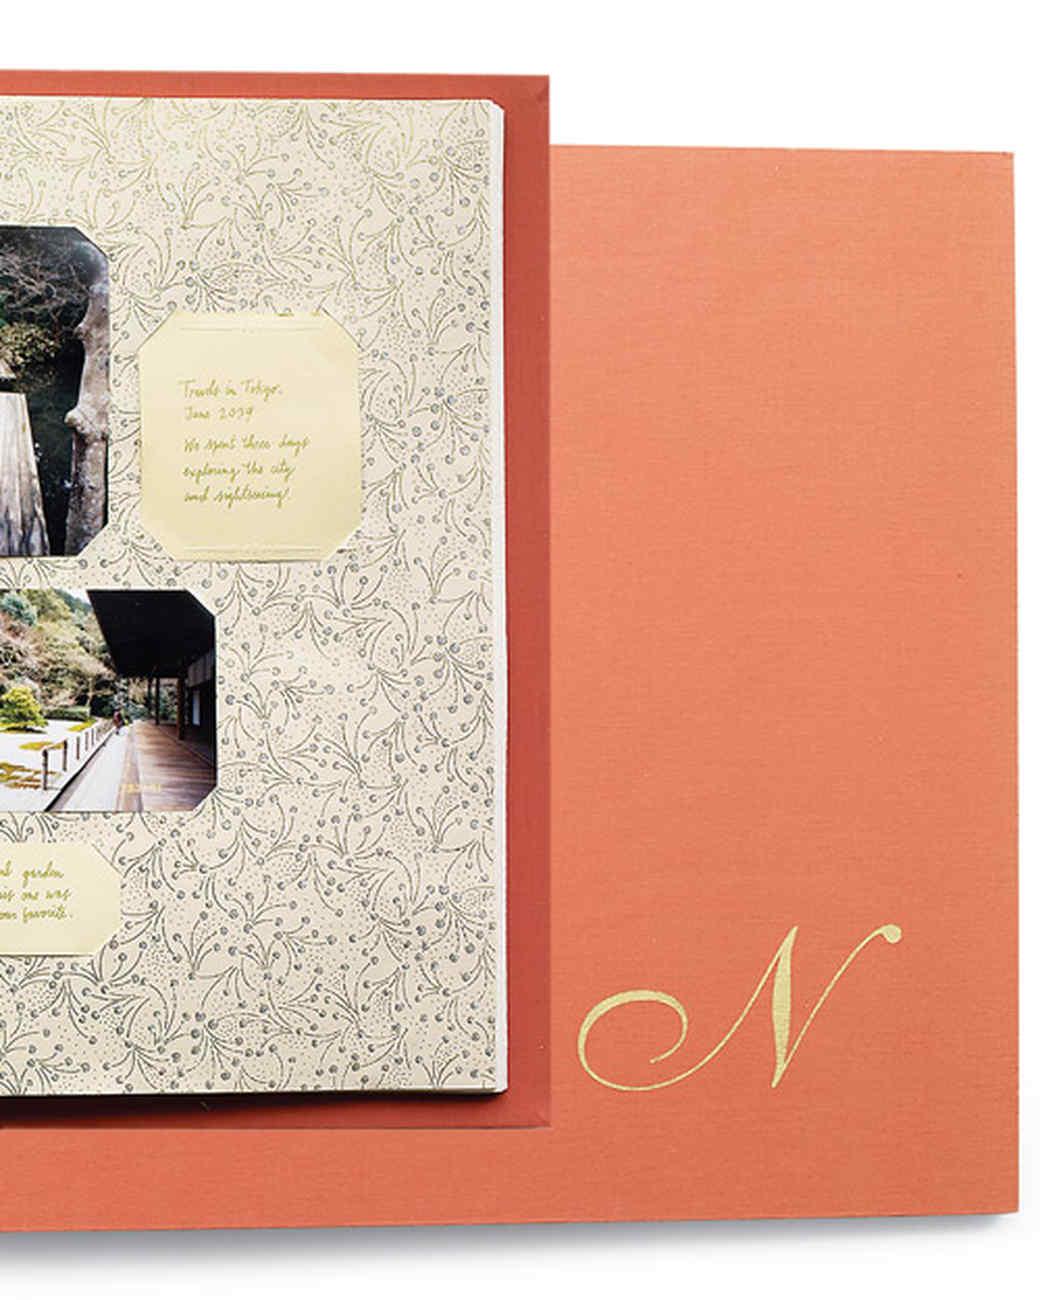 36 Great Scrapbook Ideas and Albums | Martha Stewart